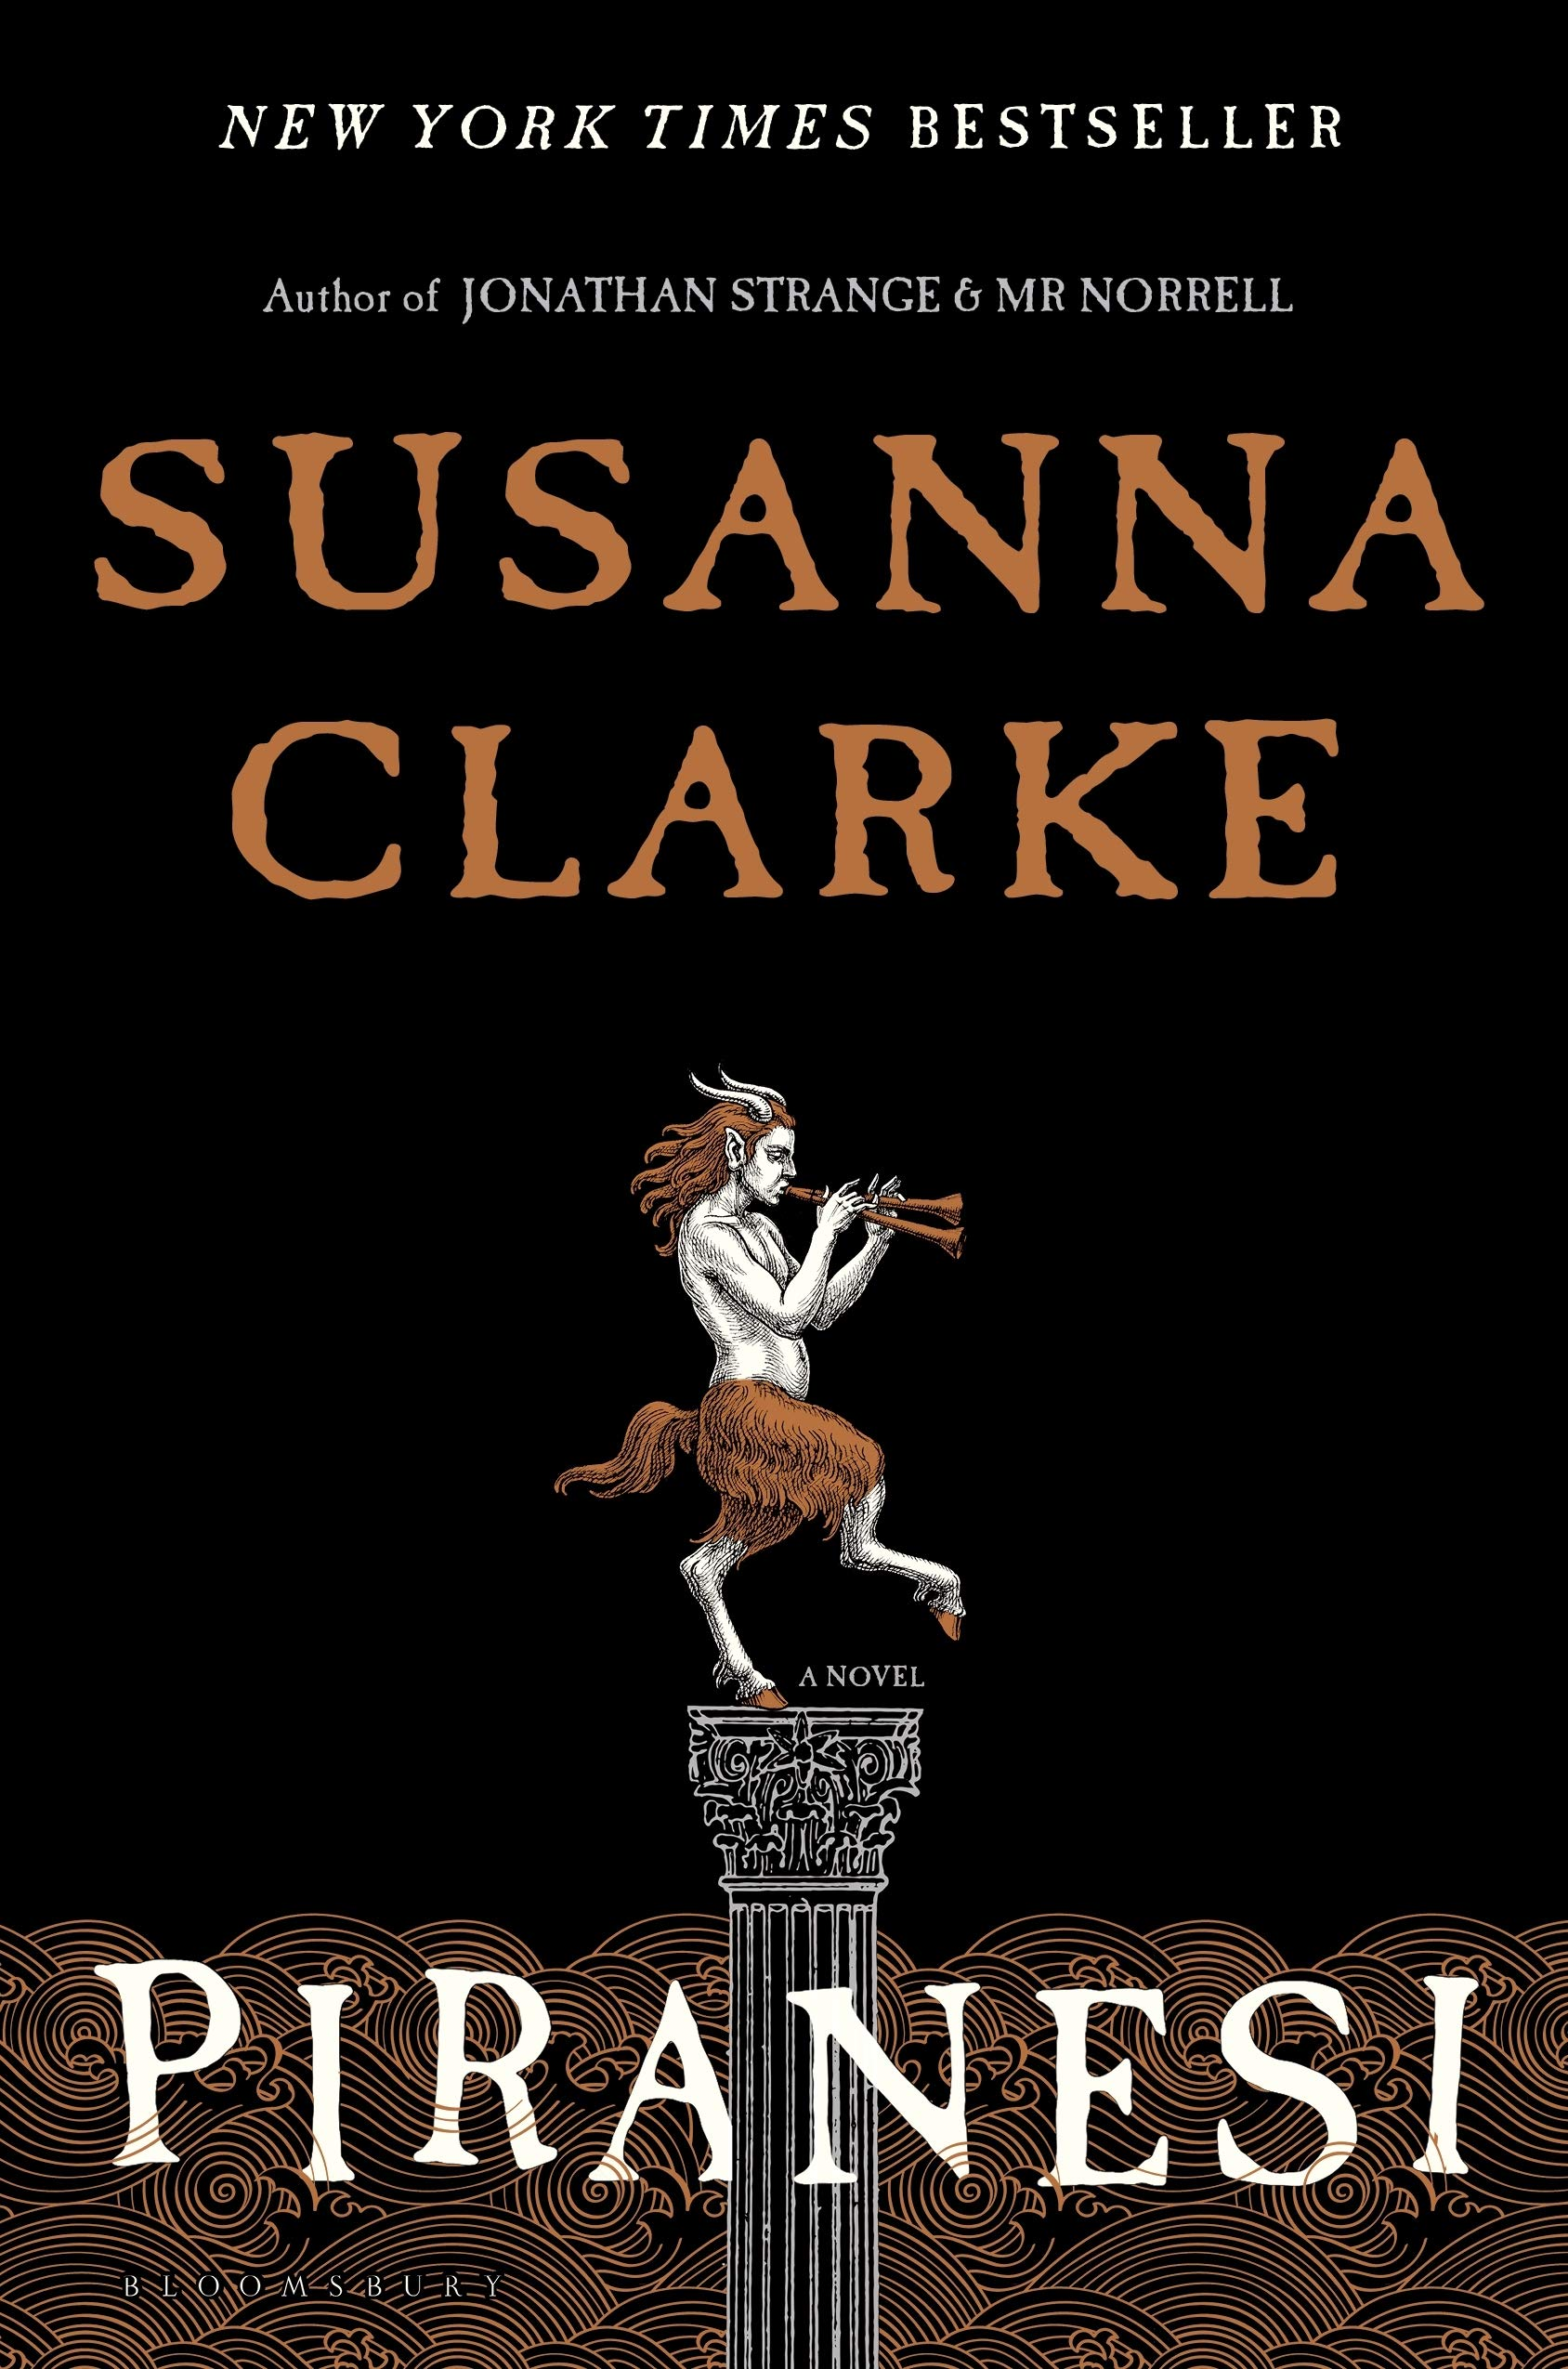 « Piranesi », de Susanna Clark